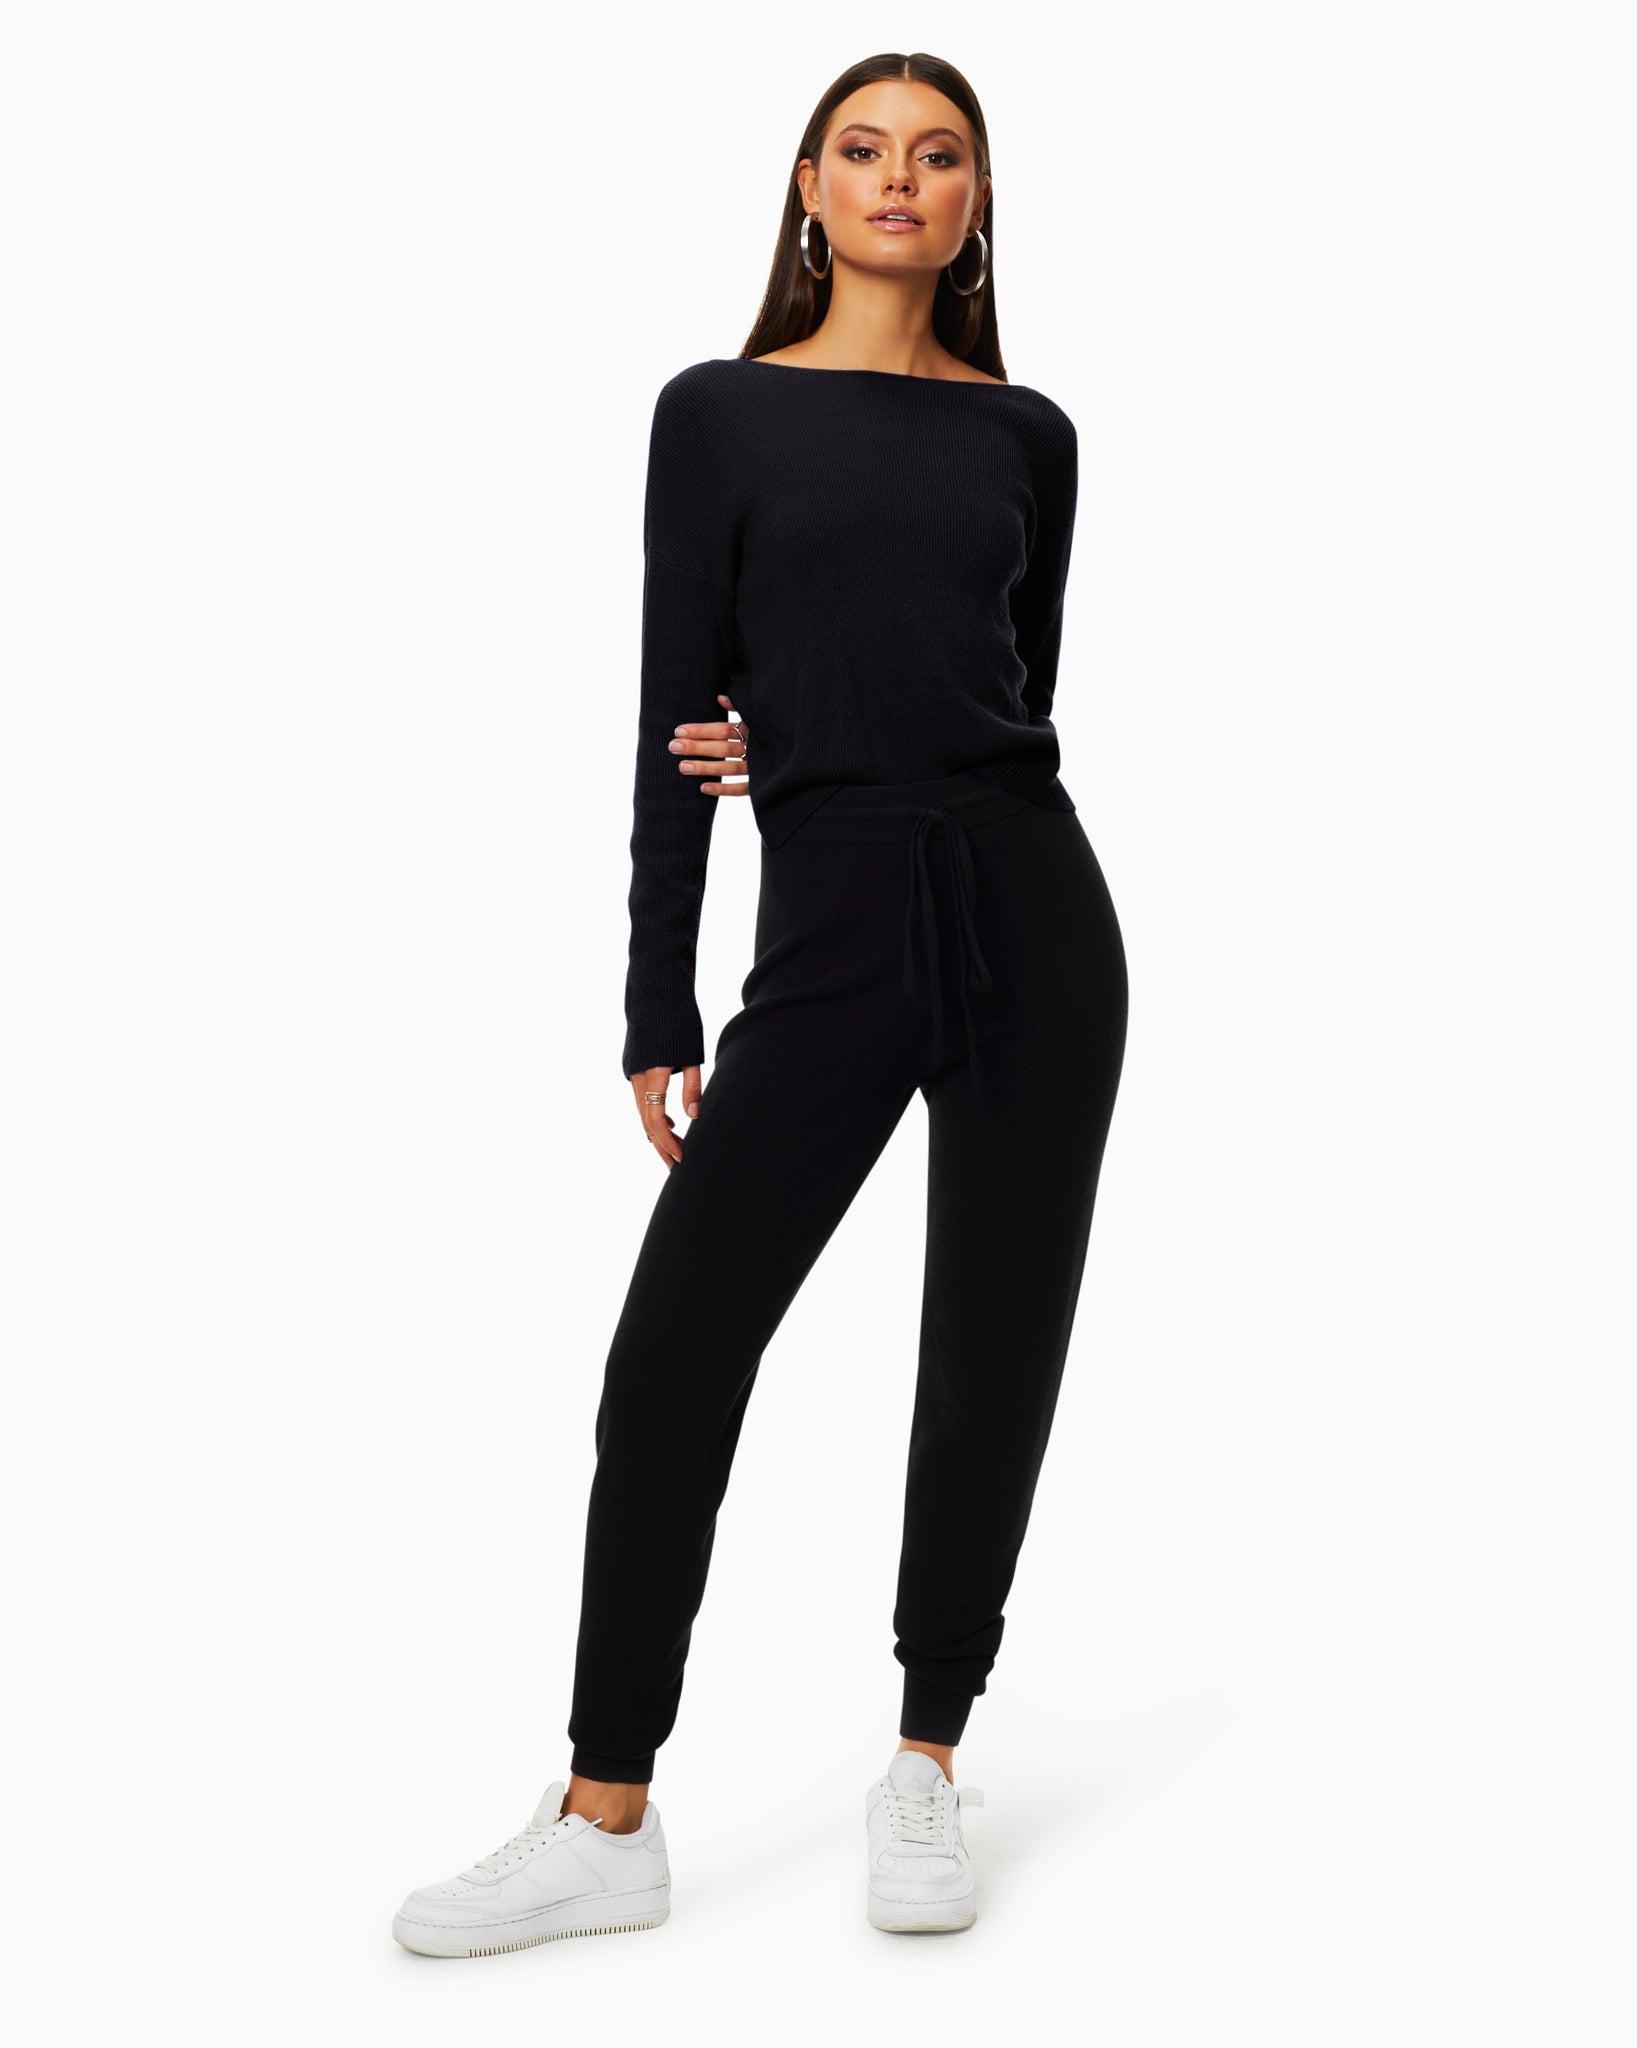 Landon Knit Jogger in Black - Black - Size: XL